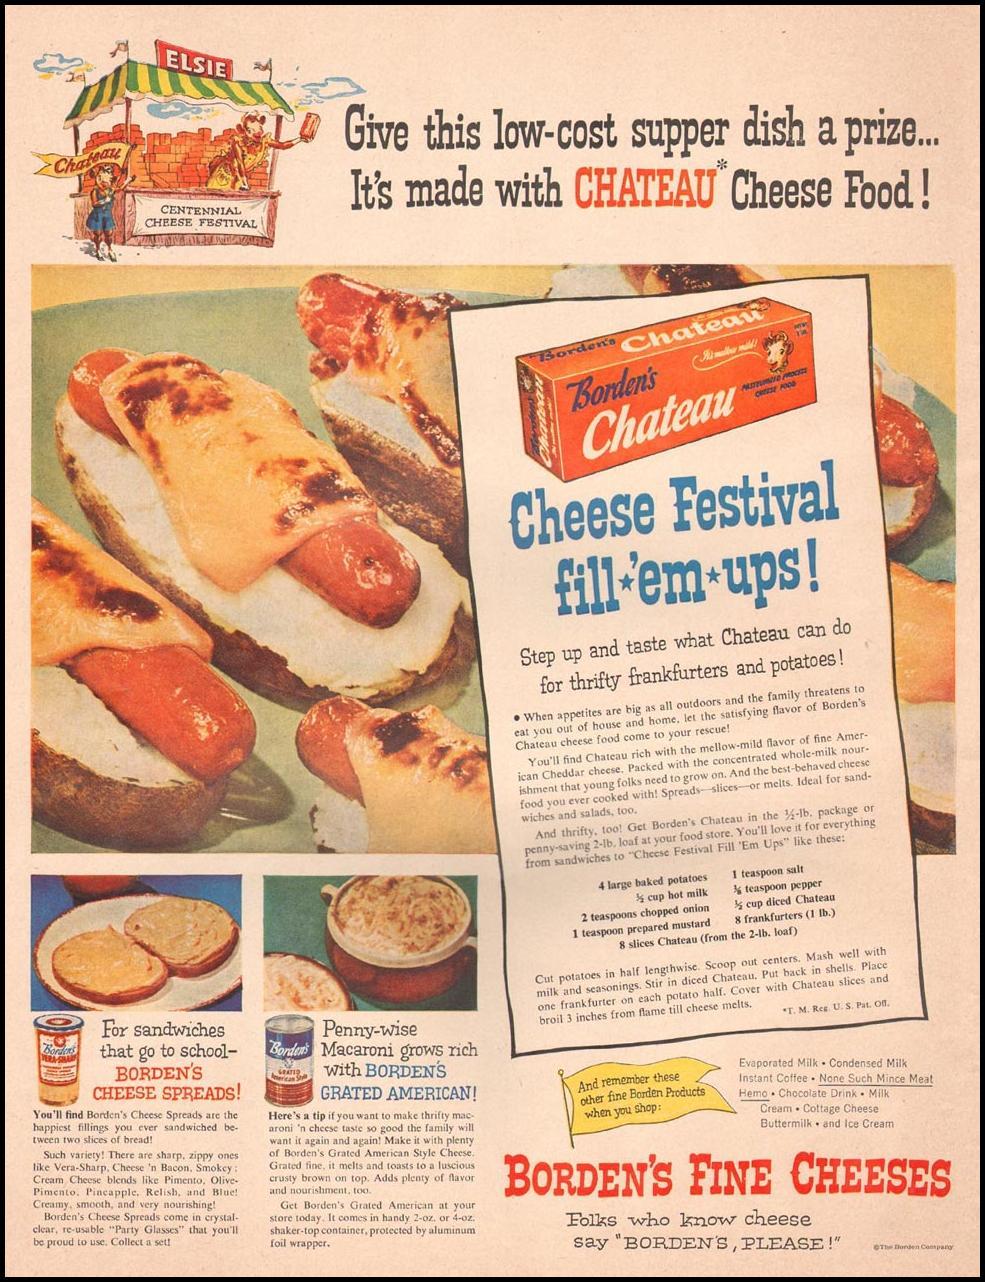 BORDEN'S FINE CHEESES LIFE 10/01/1951